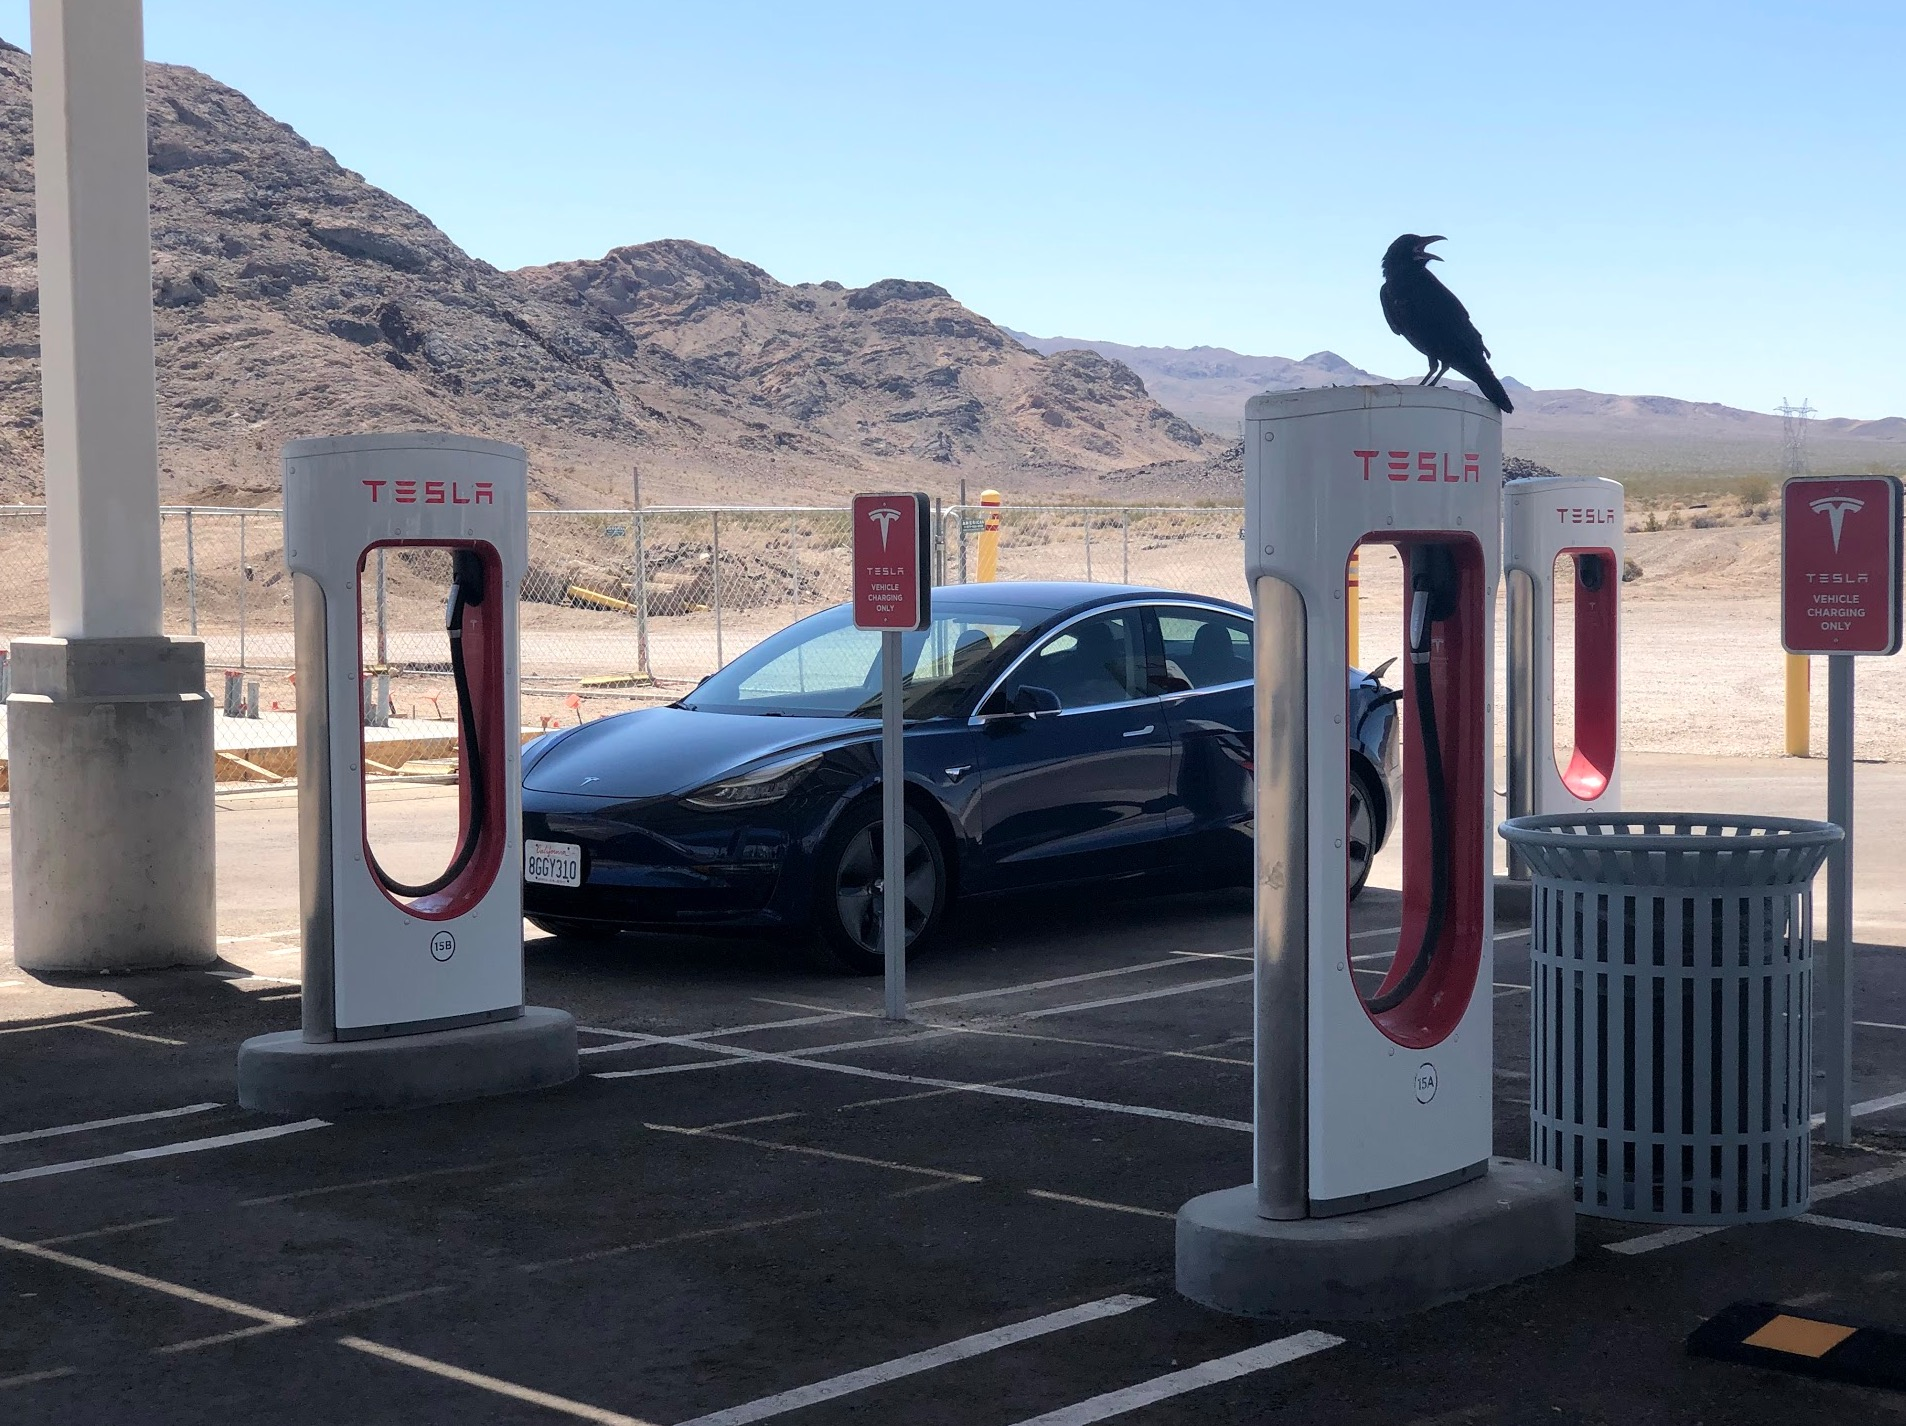 Tesla Model 3 is the best road trip car - Electrek